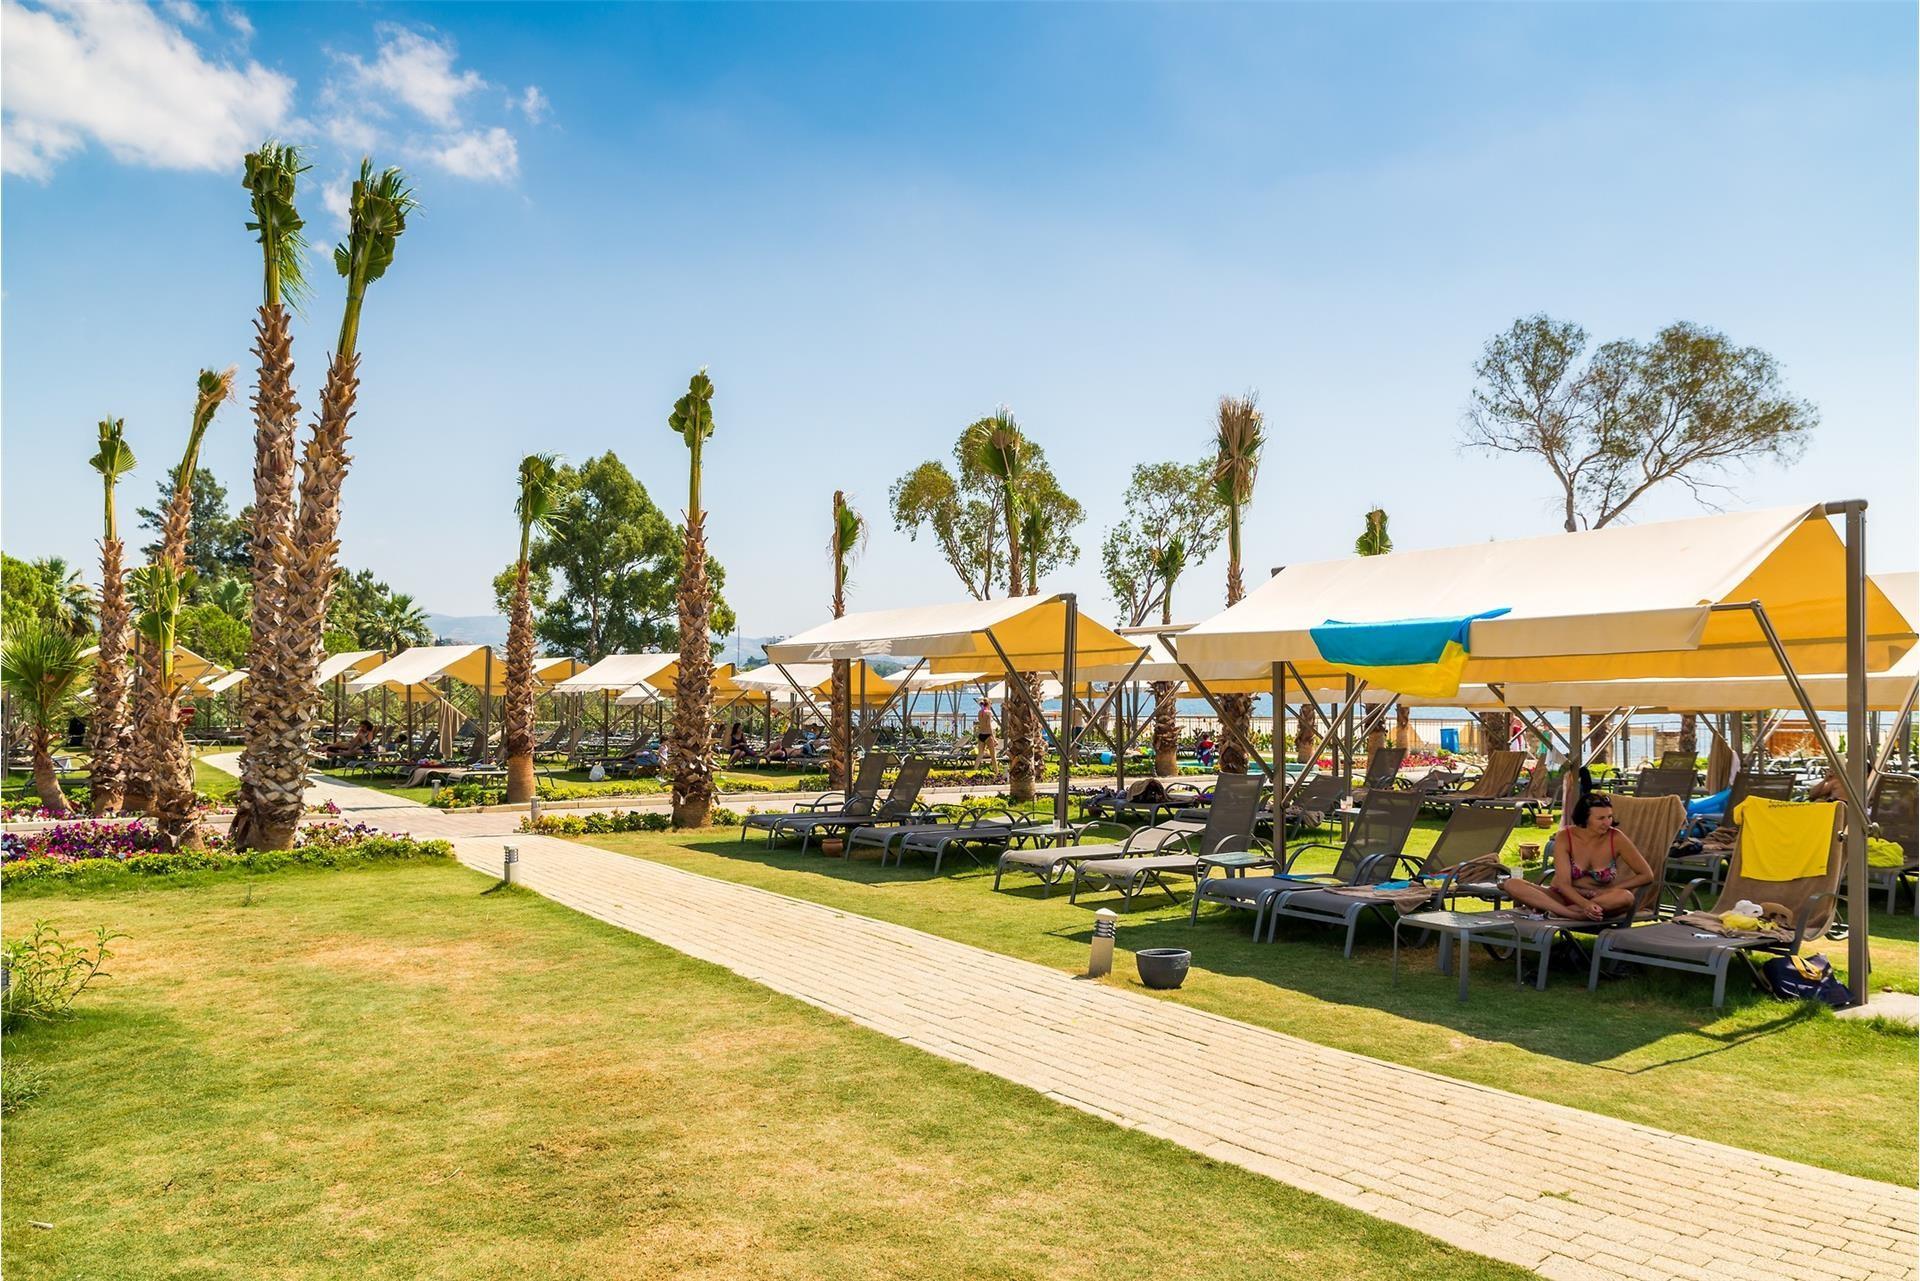 Amara Sealight Hotel - градина